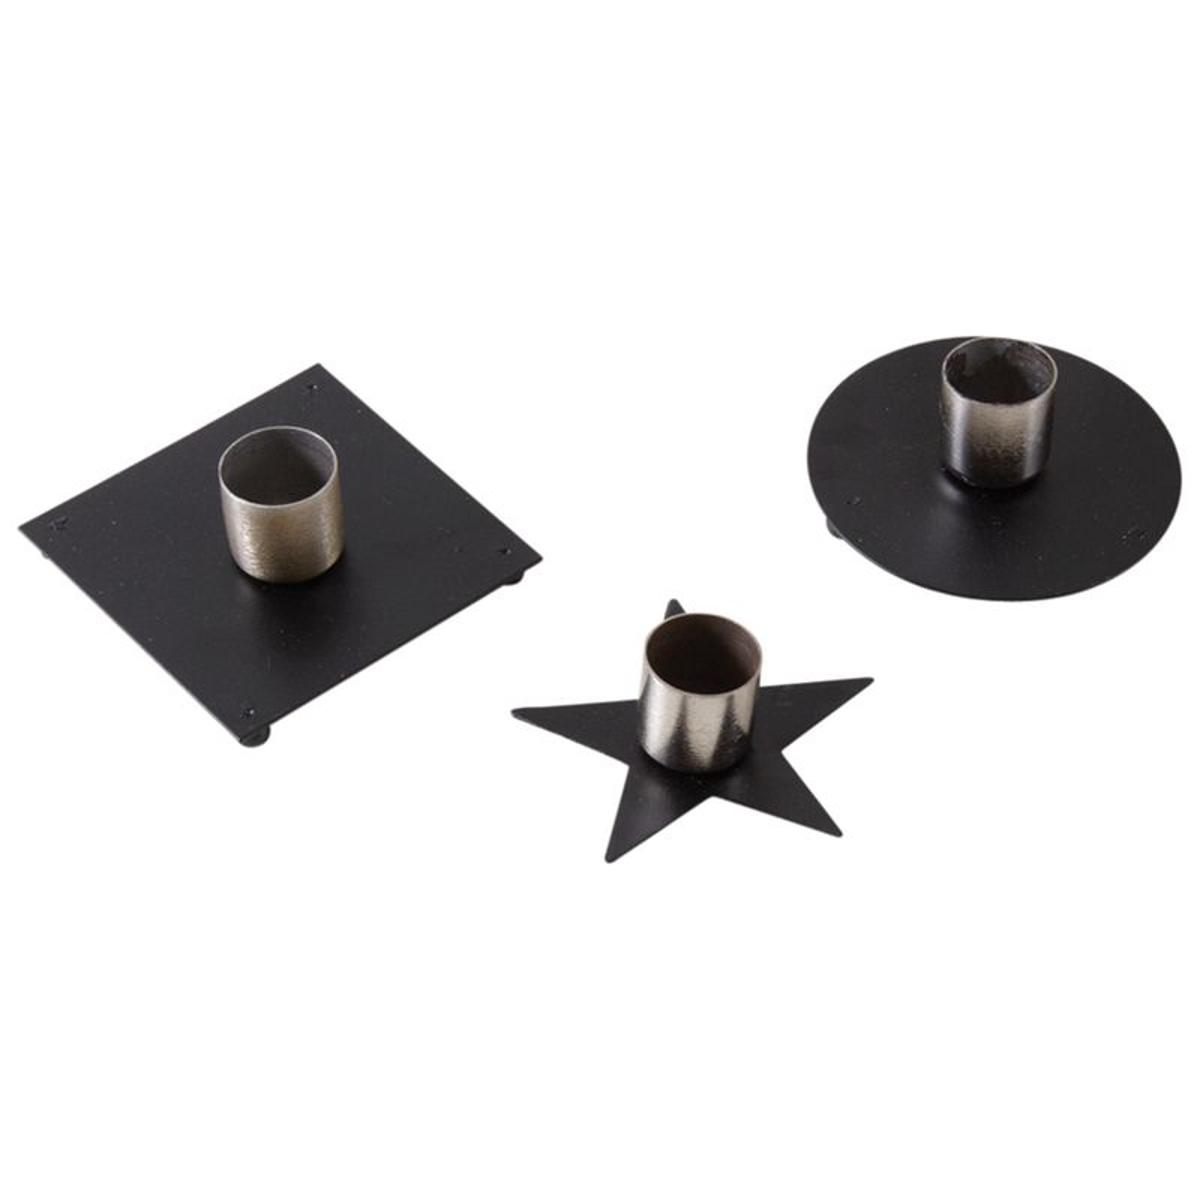 Bougeoir en métal laqué noir (Lot de 3)